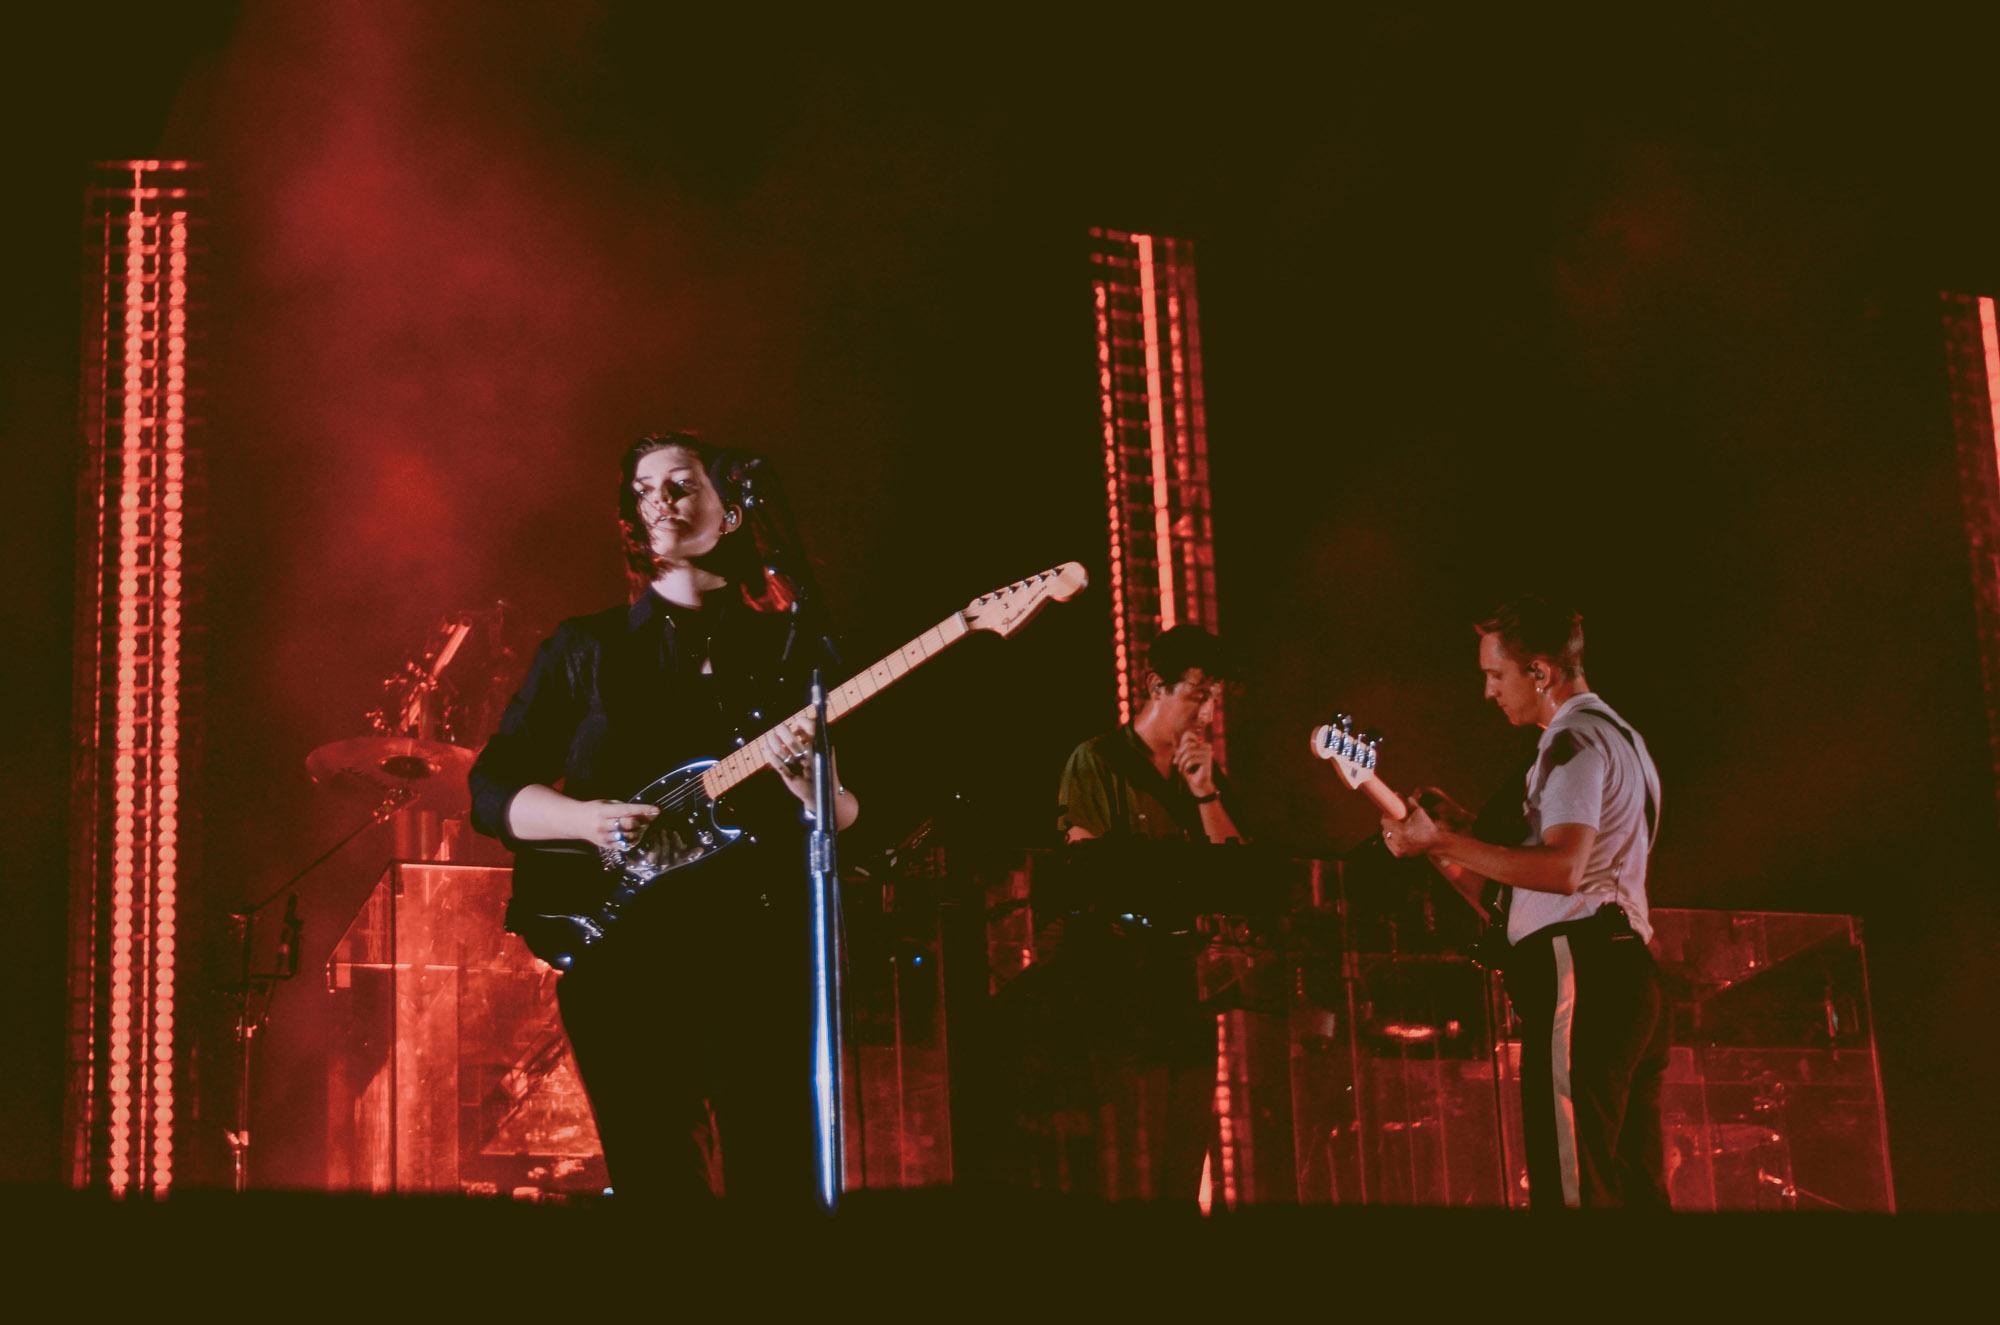 iii Points Festival - October 13-15, 2017 //Miami, FLPhotos by Stephanie Estrada